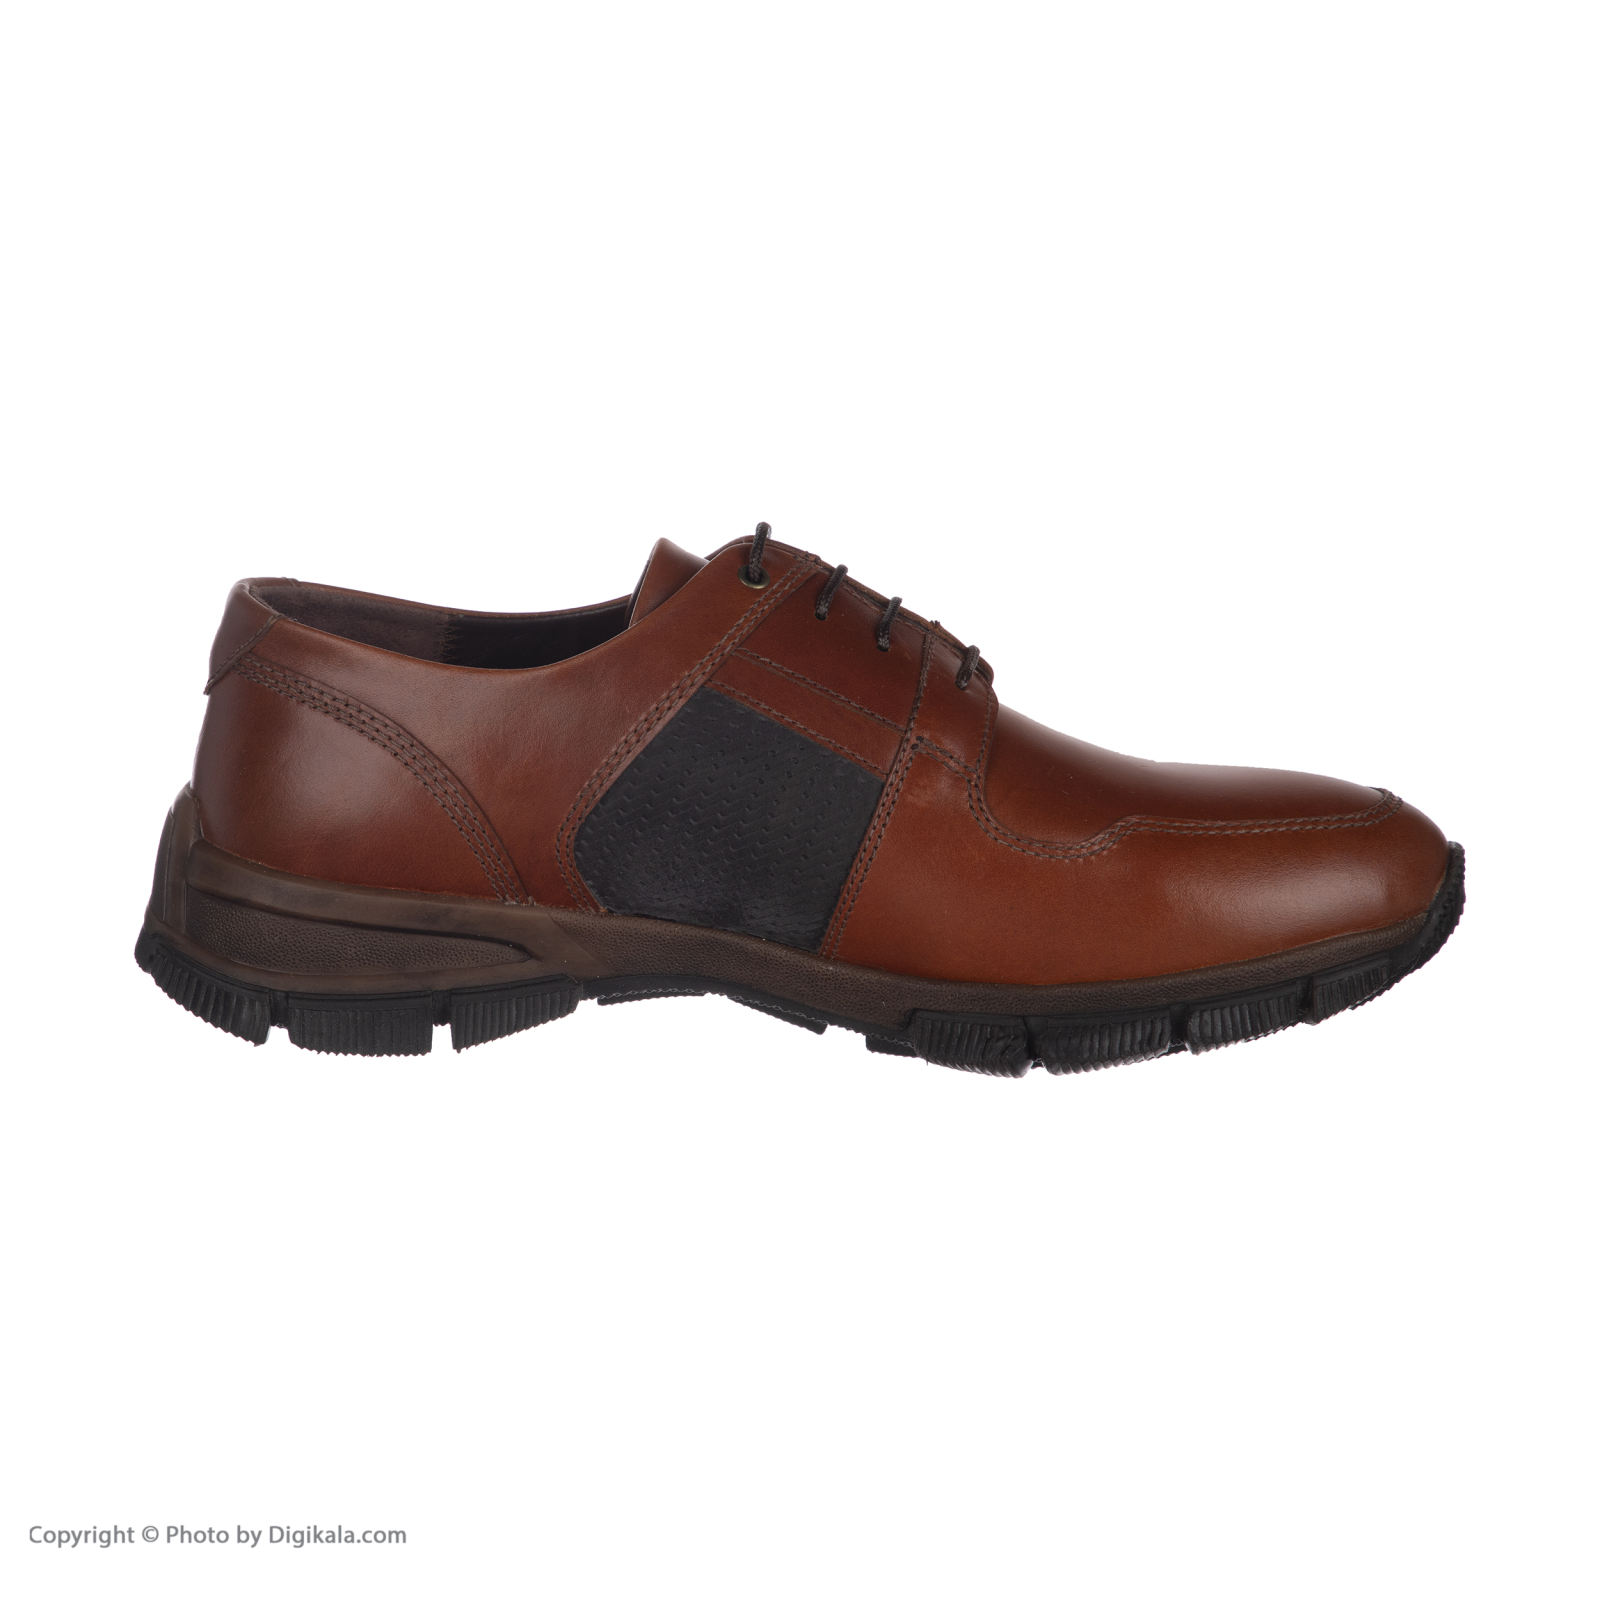 کفش روزمره مردانه دانادل مدل 8604B503136 -  - 5